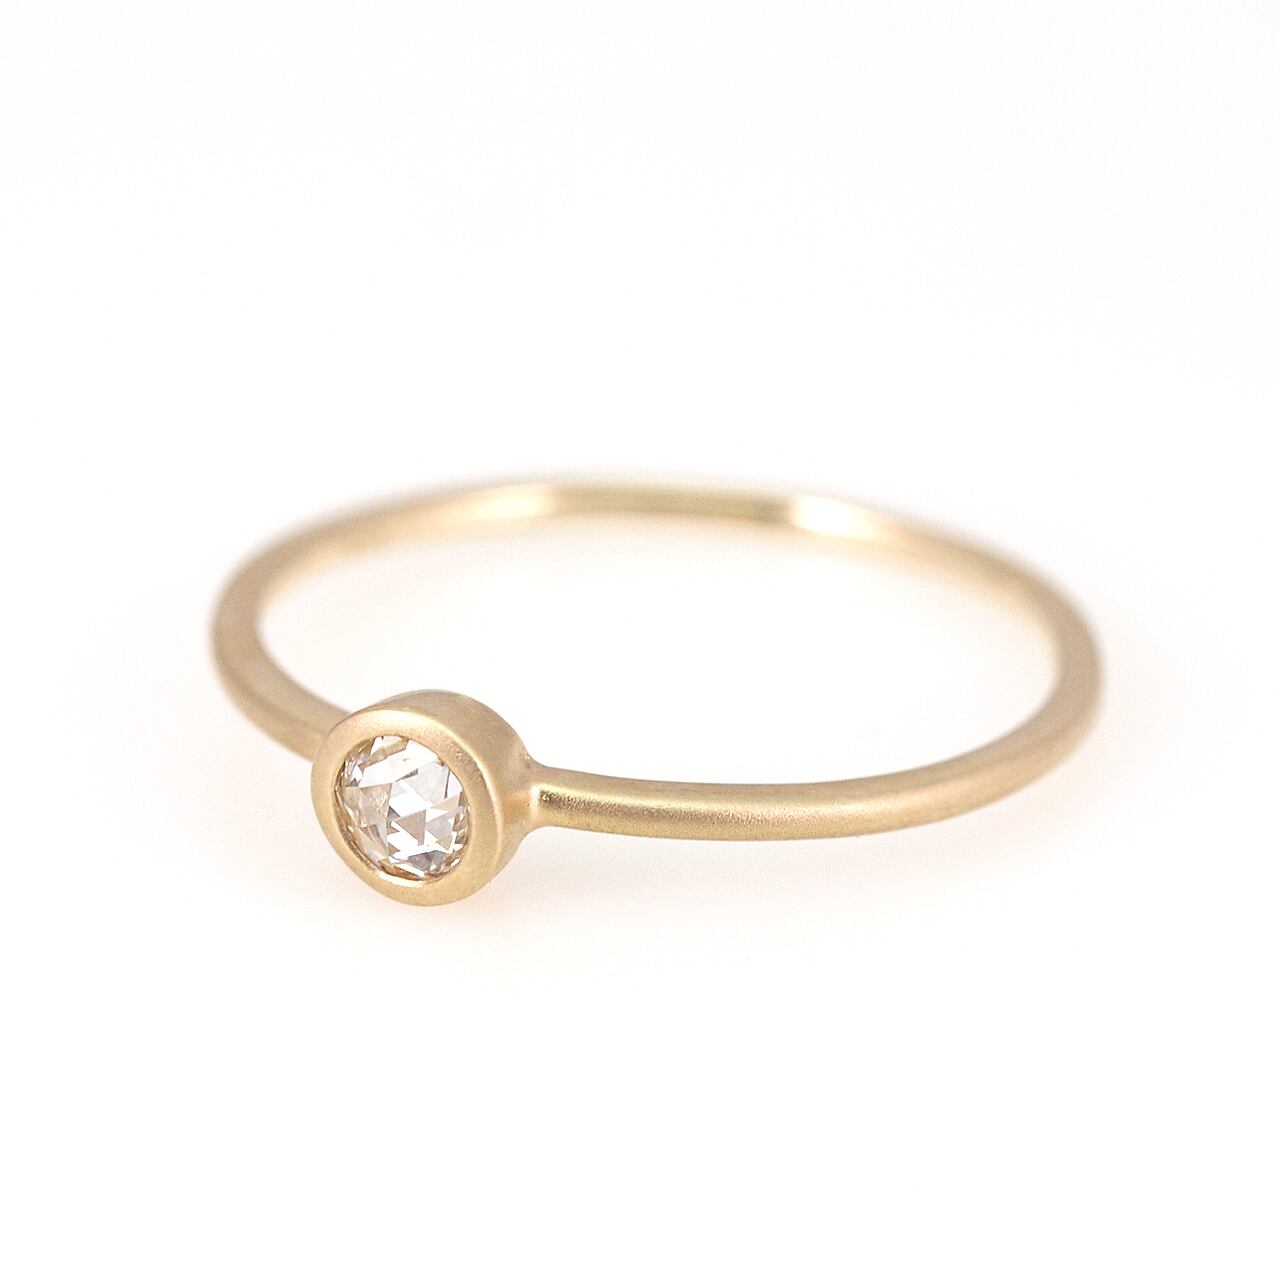 Rosecut diamond ring / Round